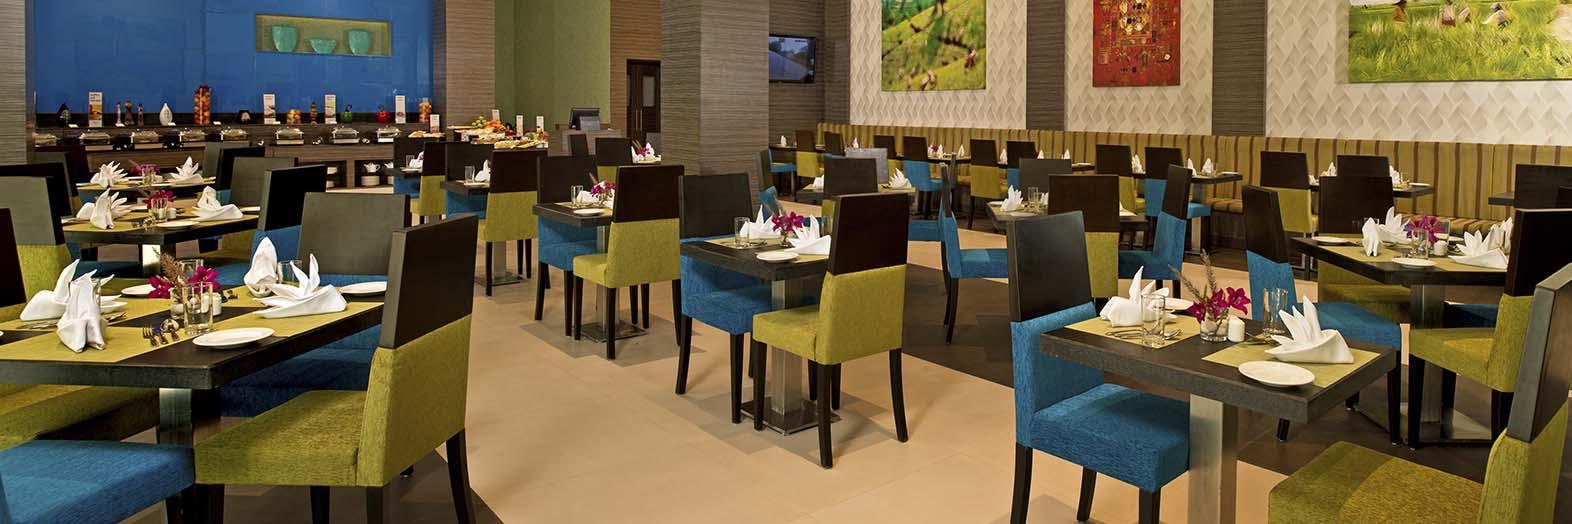 Restaurants in Dahej SEZ